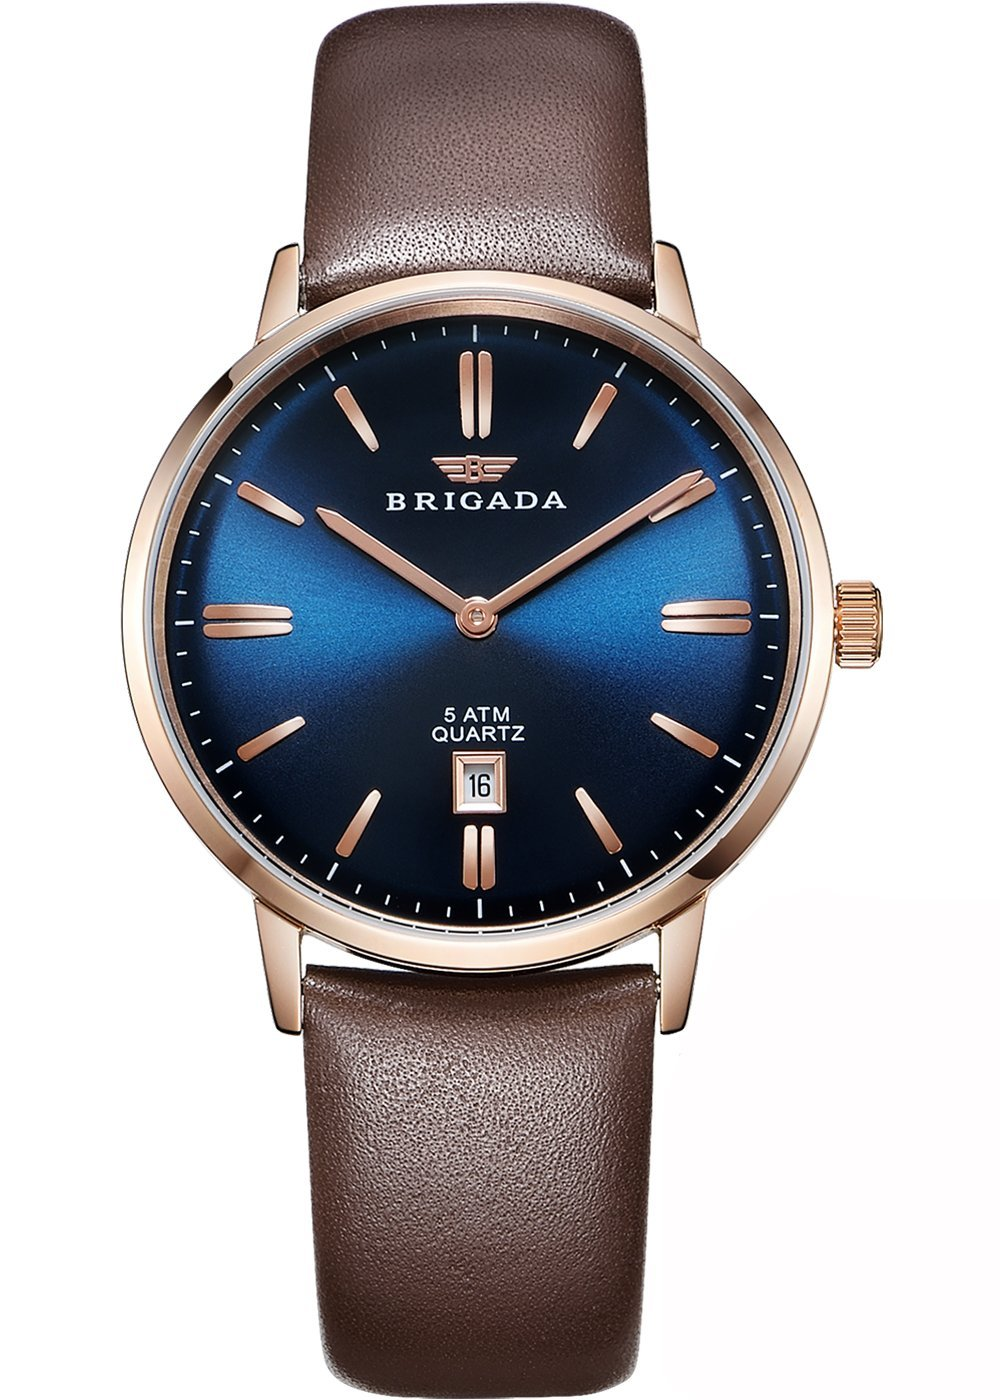 7c3045e1d679 Brigada Men's Watch Coffee Brown Watch Band, Genuine Leather, Adult,  Quartz, Business, Simple, Wristwatch, coffee color